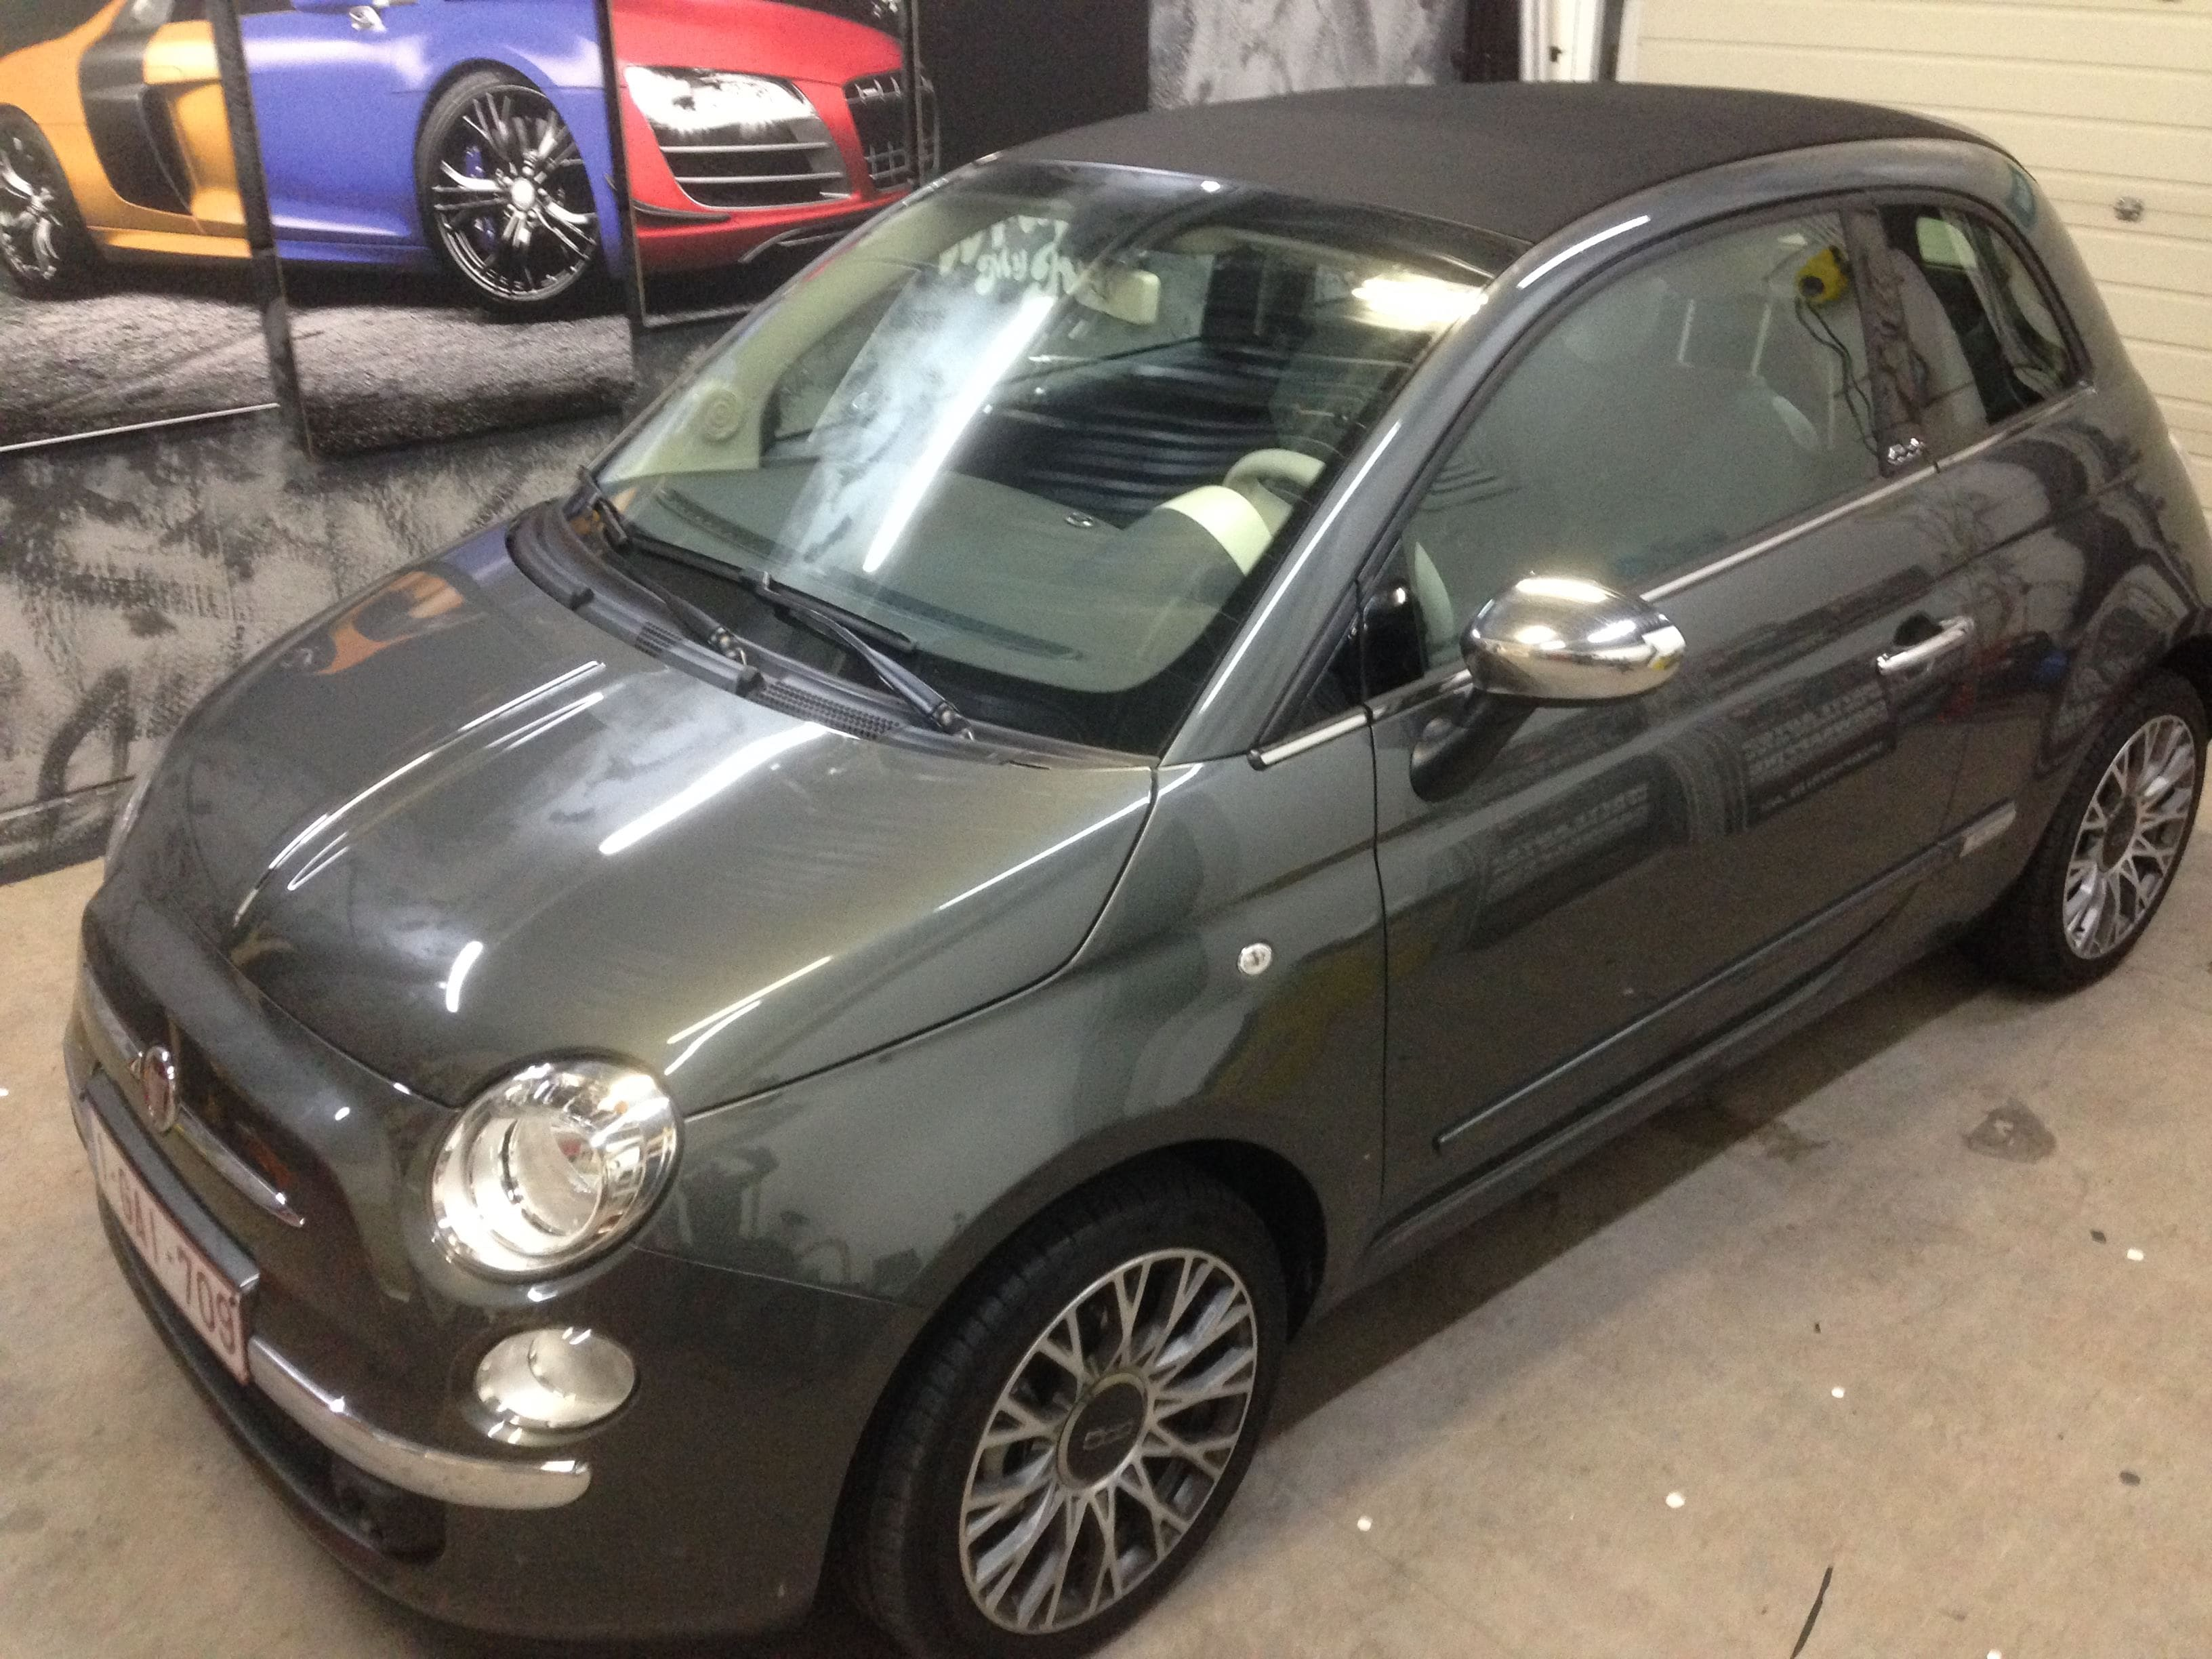 Fiat 500 met Glossy White Wrap, Carwrapping door Wrapmyride.nu Foto-nr:5722, ©2020